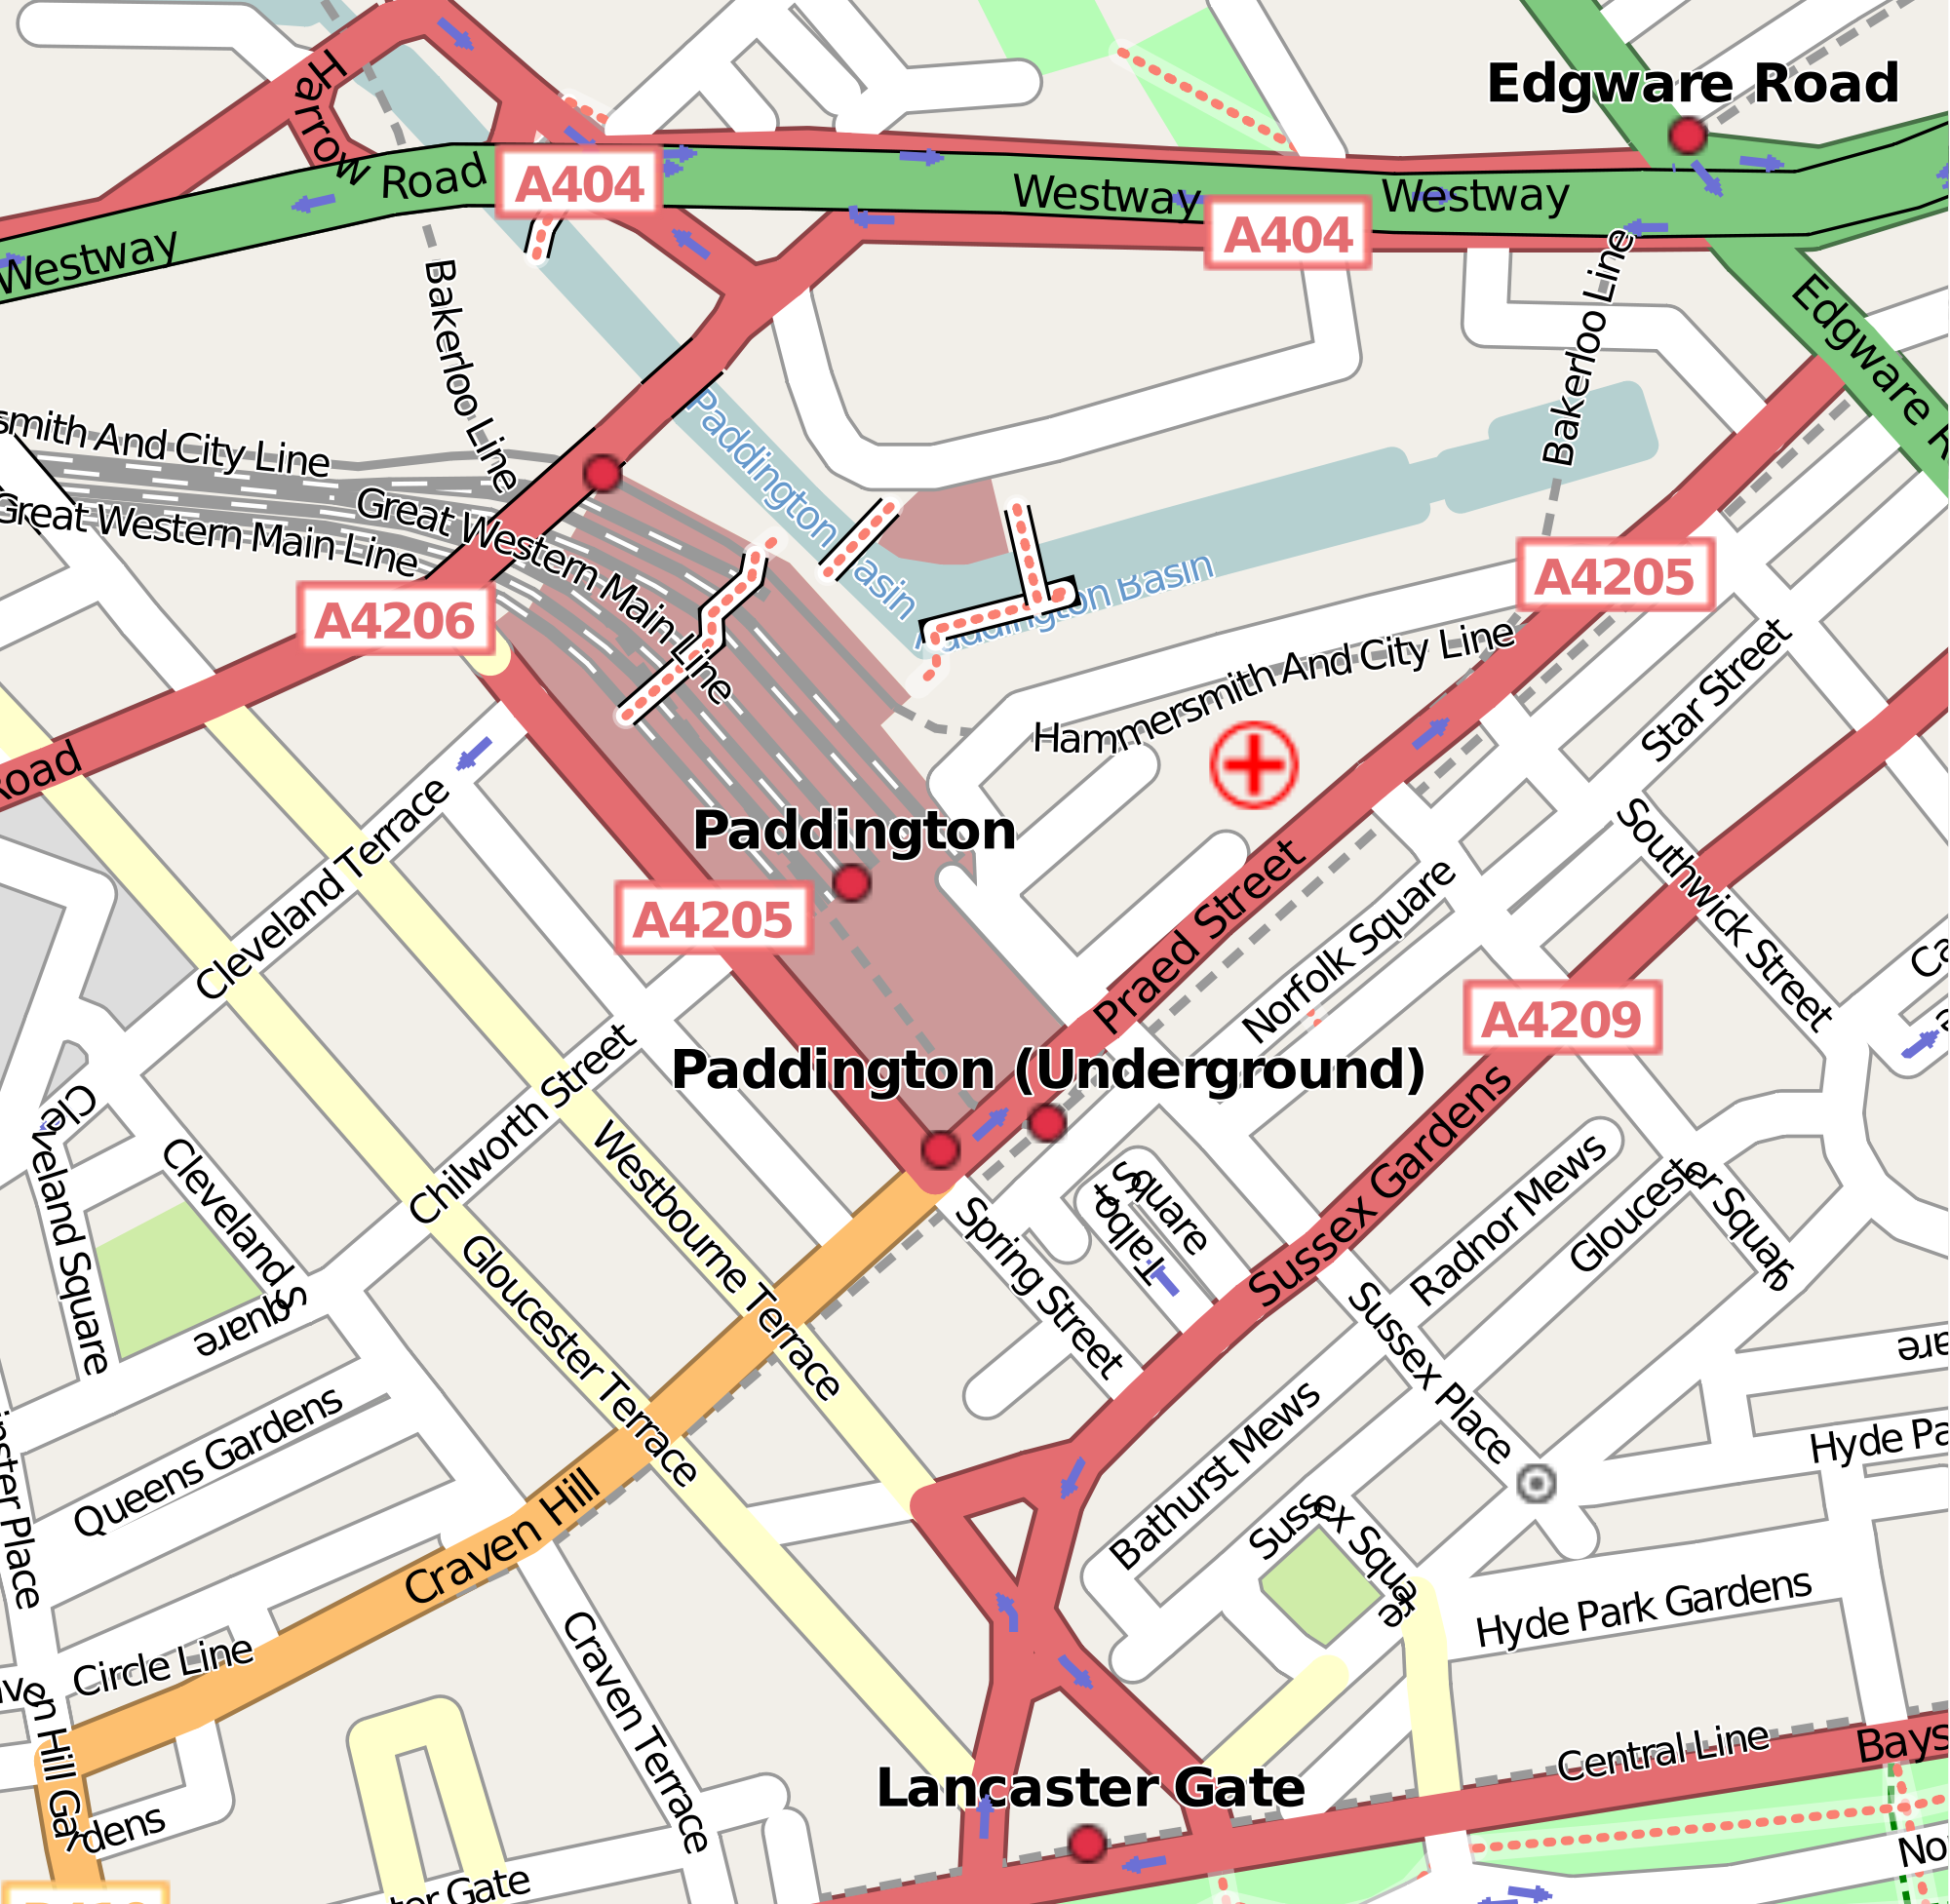 How Do I Get From St Pancras To Paddington